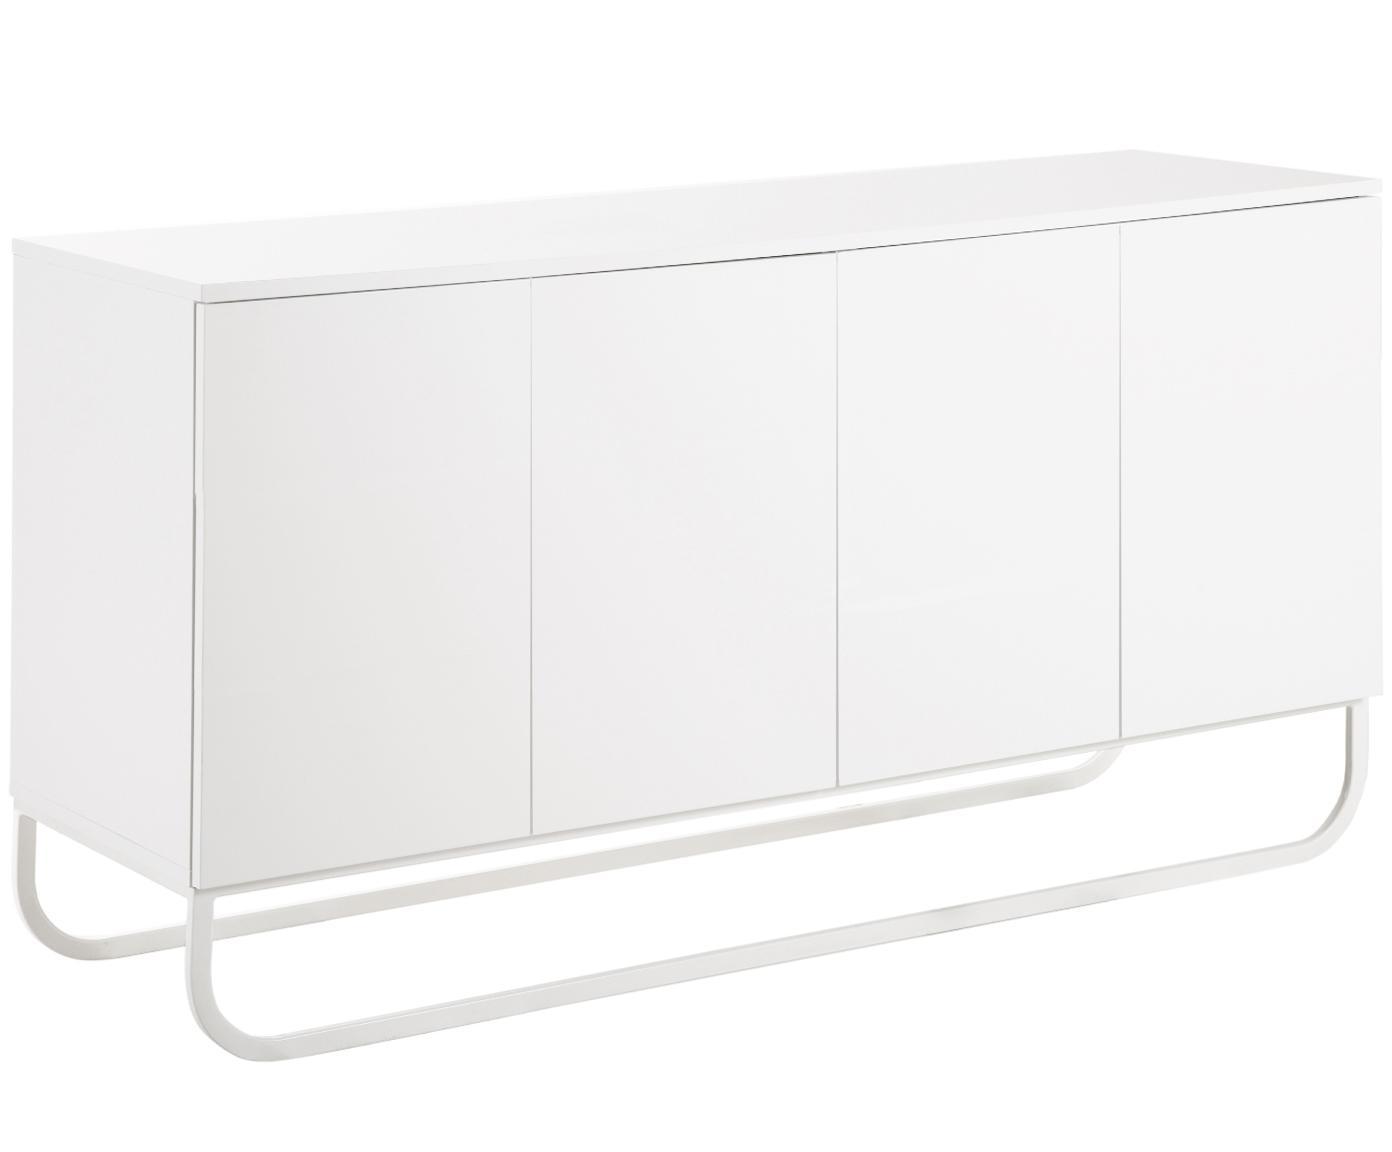 Klassiek dressoir Sanford in wit, Frame: gelakt MDF, Frame: mat wit. Onderstel: mat wit, 160 x 83 cm